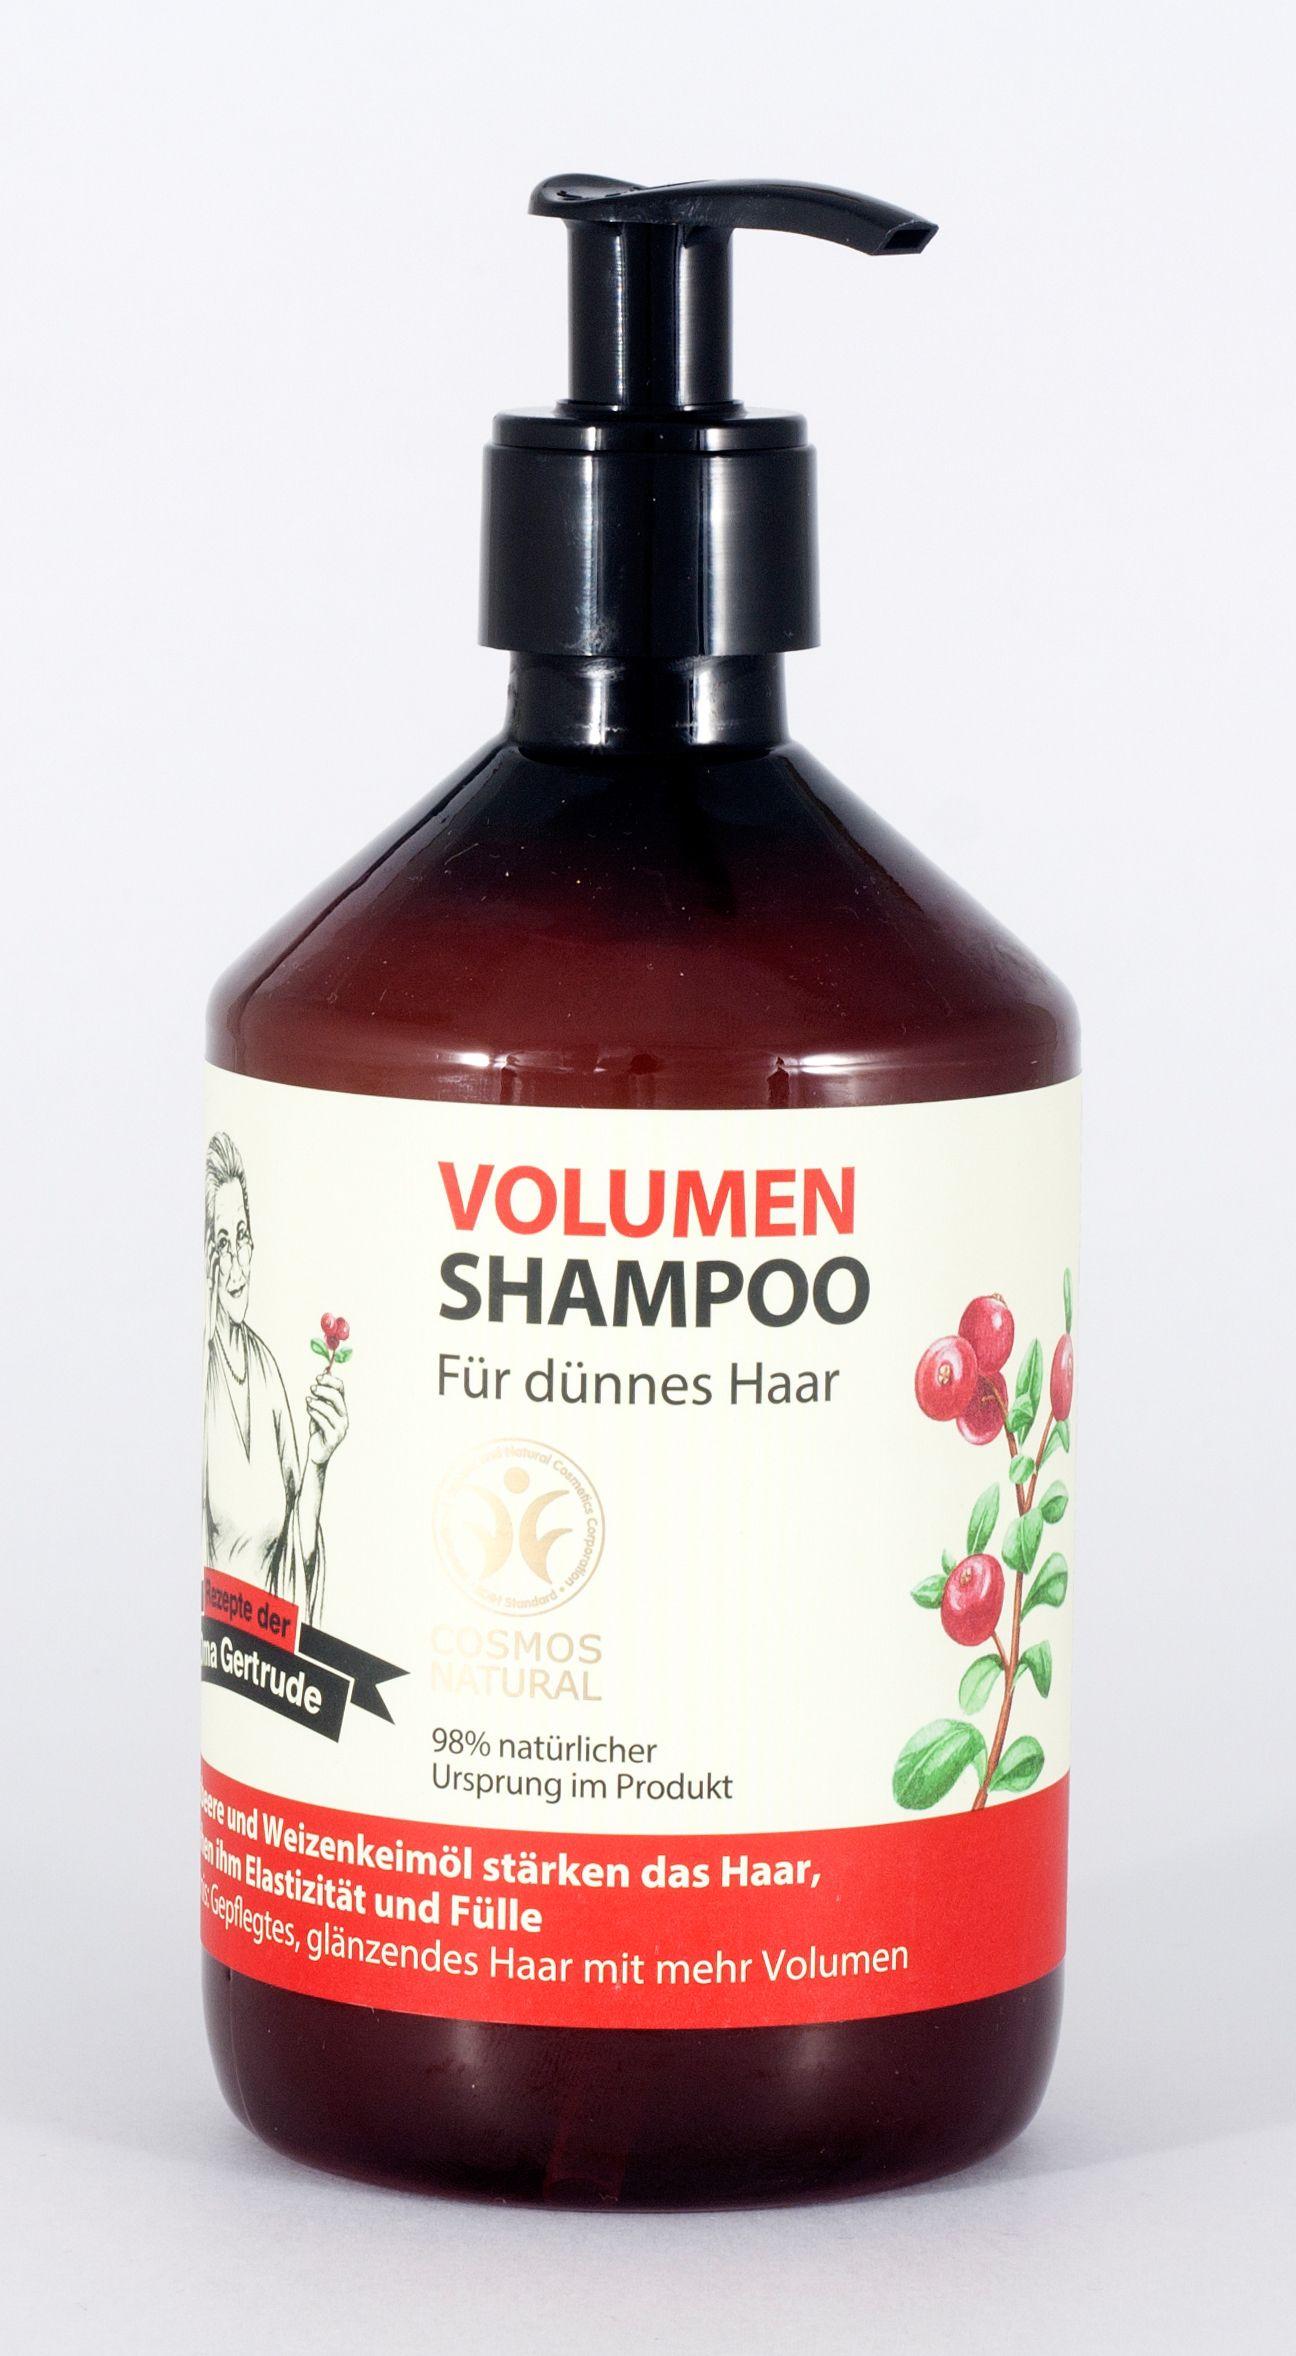 shampoo f r feines haar 500ml oma gertrude oma. Black Bedroom Furniture Sets. Home Design Ideas